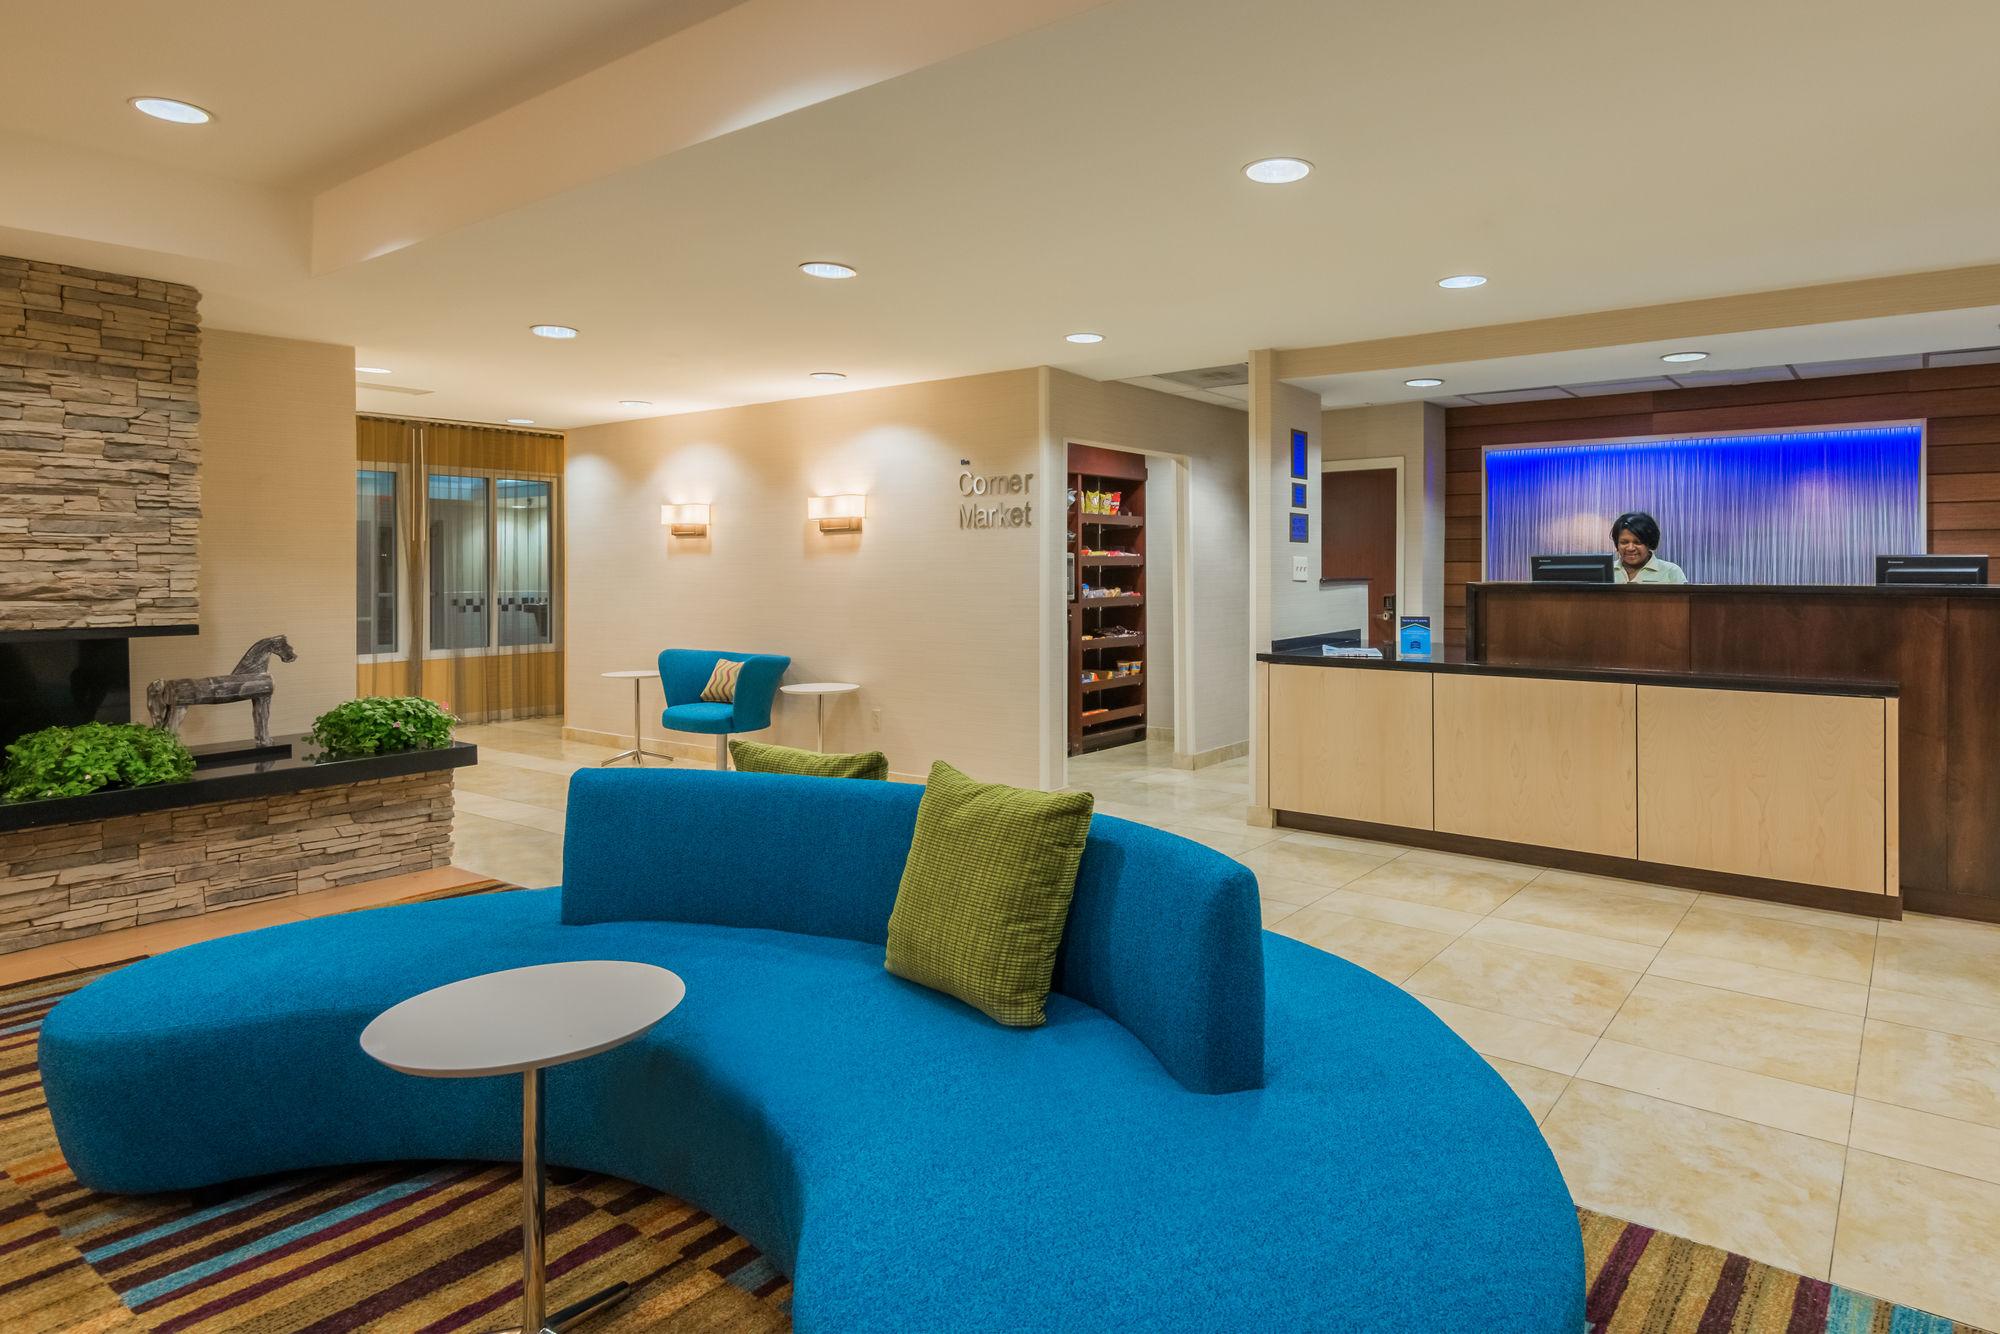 Fairfield Inn & Suites by Marriott Mobile in Mobile, AL